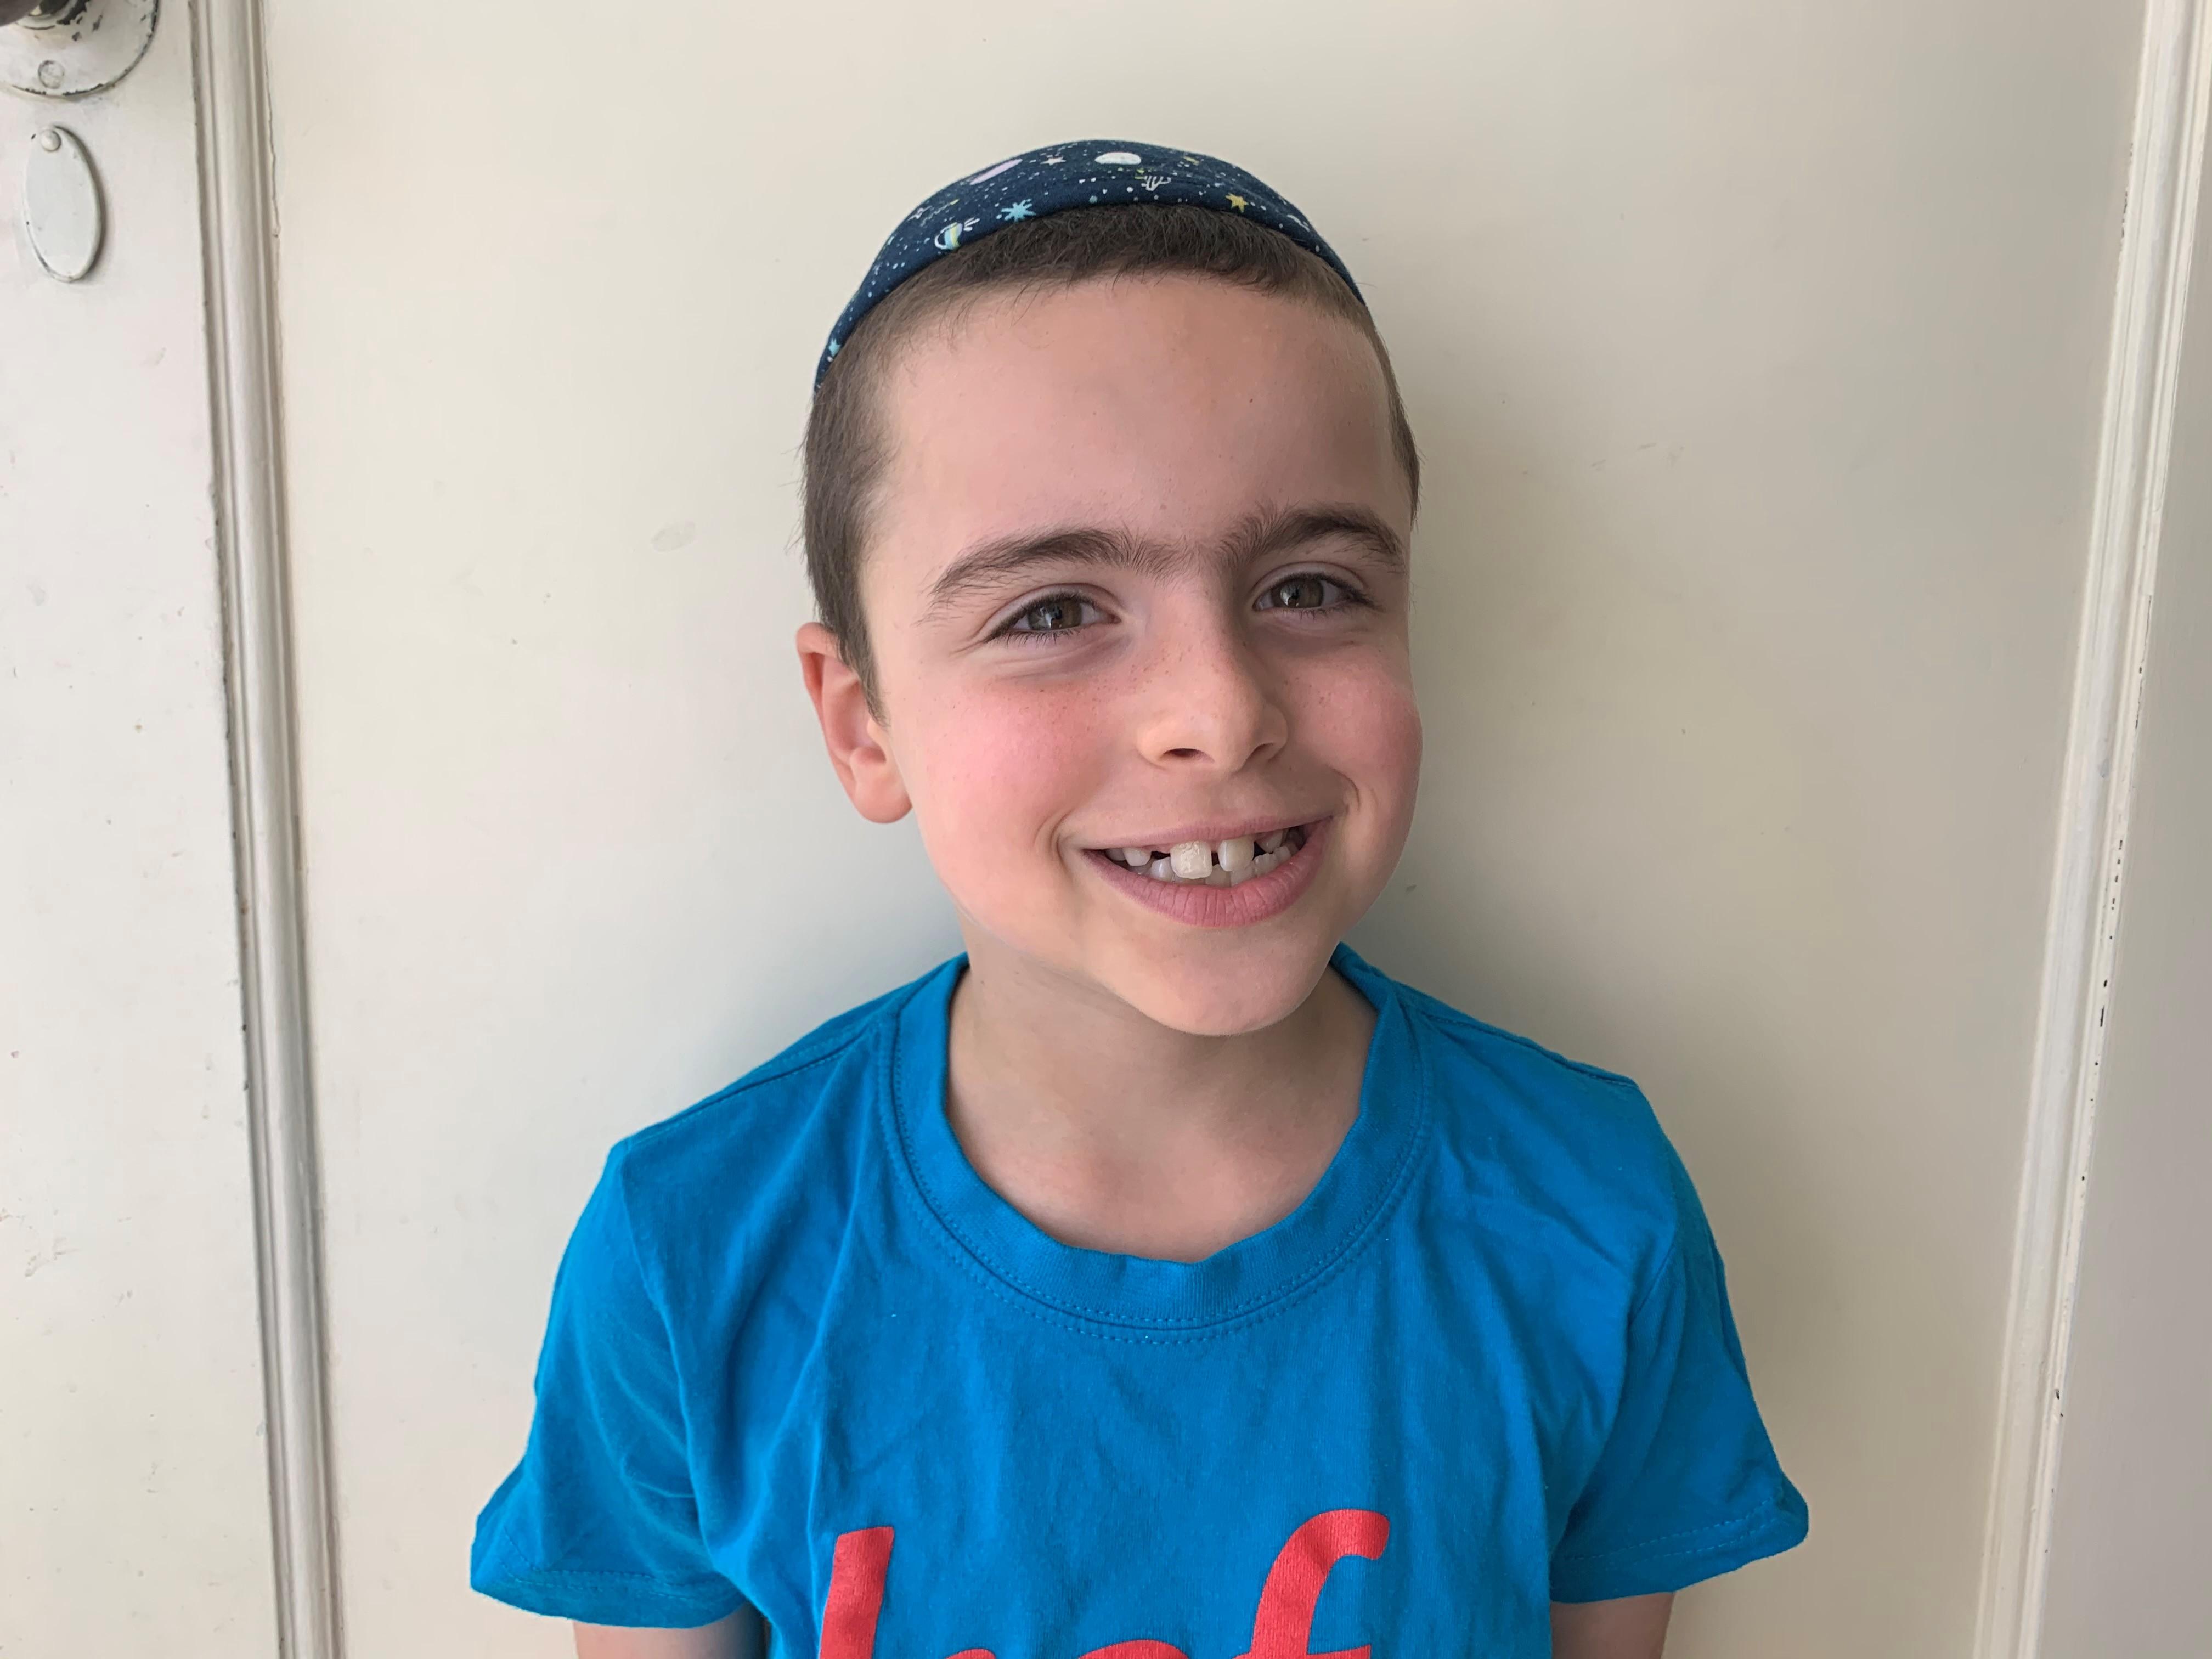 Daniel Rosenbaum Grade 3